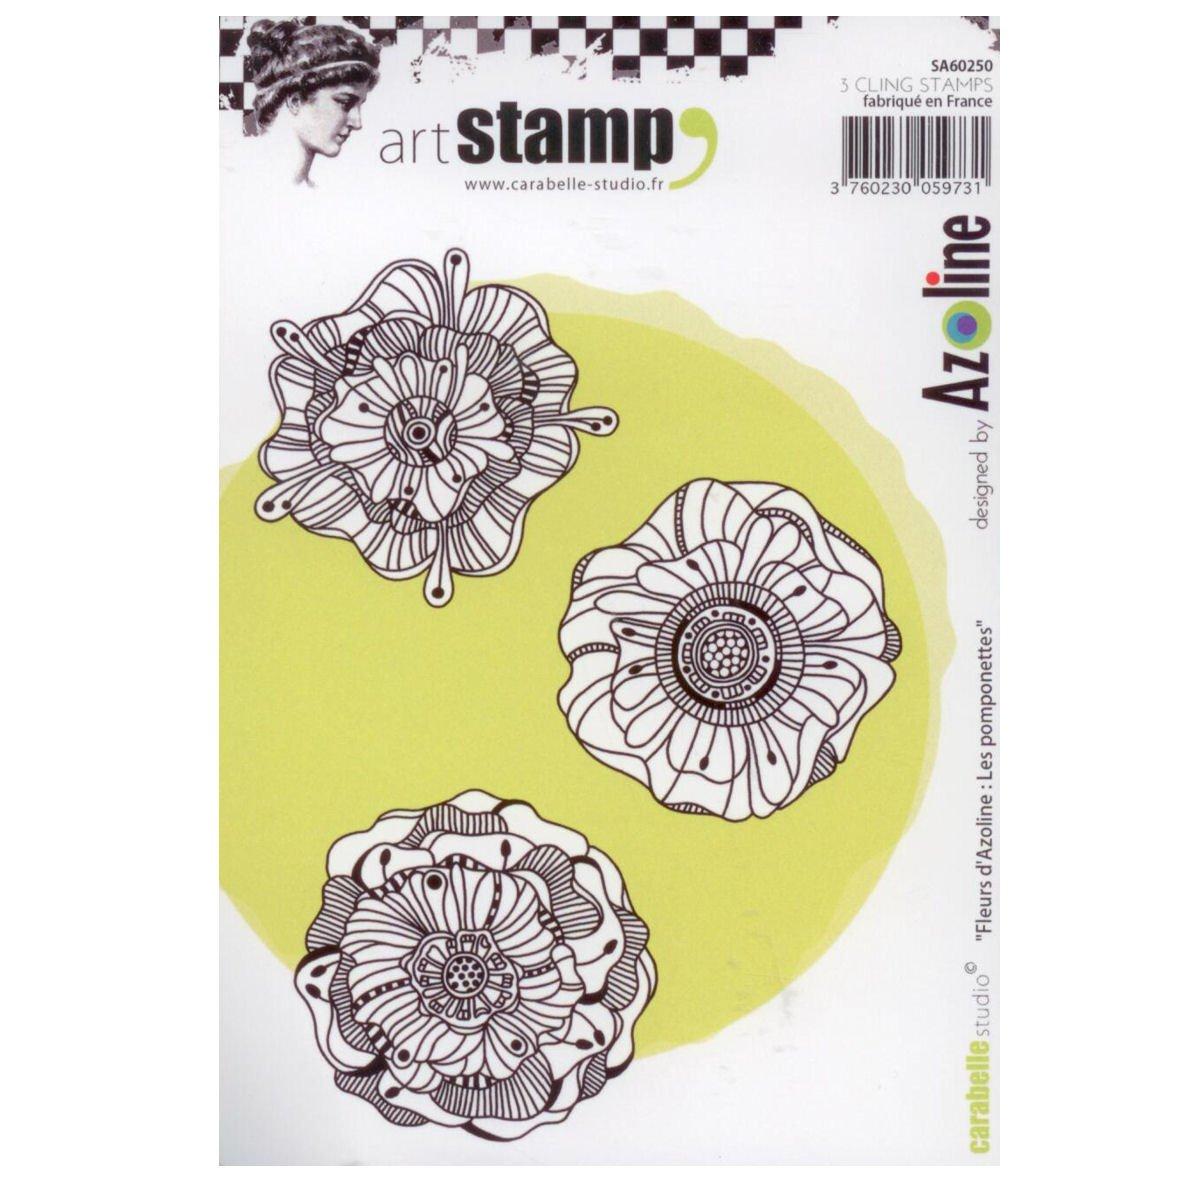 Carabelle Studio SA60250 A6 Stamp Set - Fleurs d'Azoline - Les Pomponettes